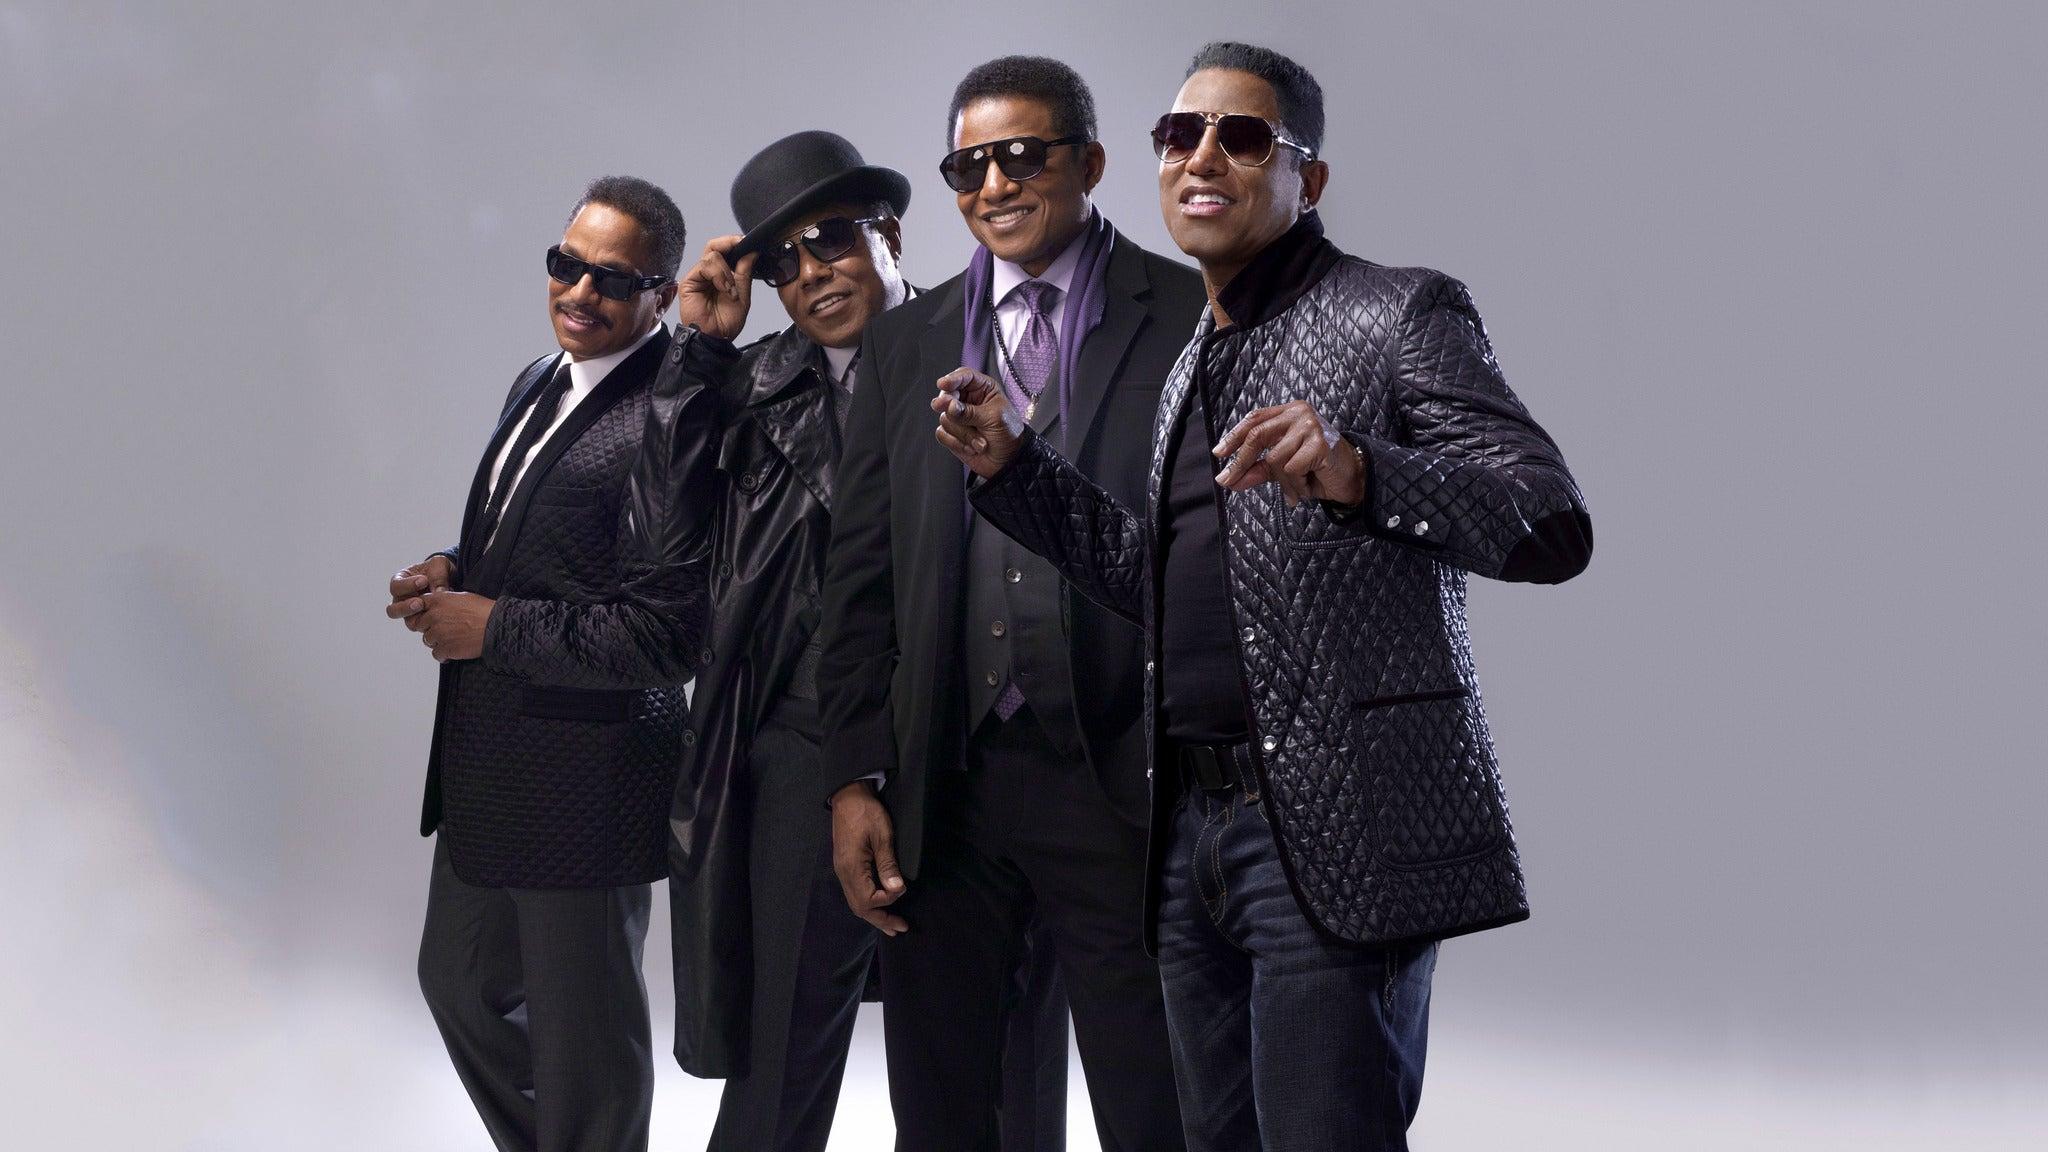 Disco Ball Presents: The Jacksons